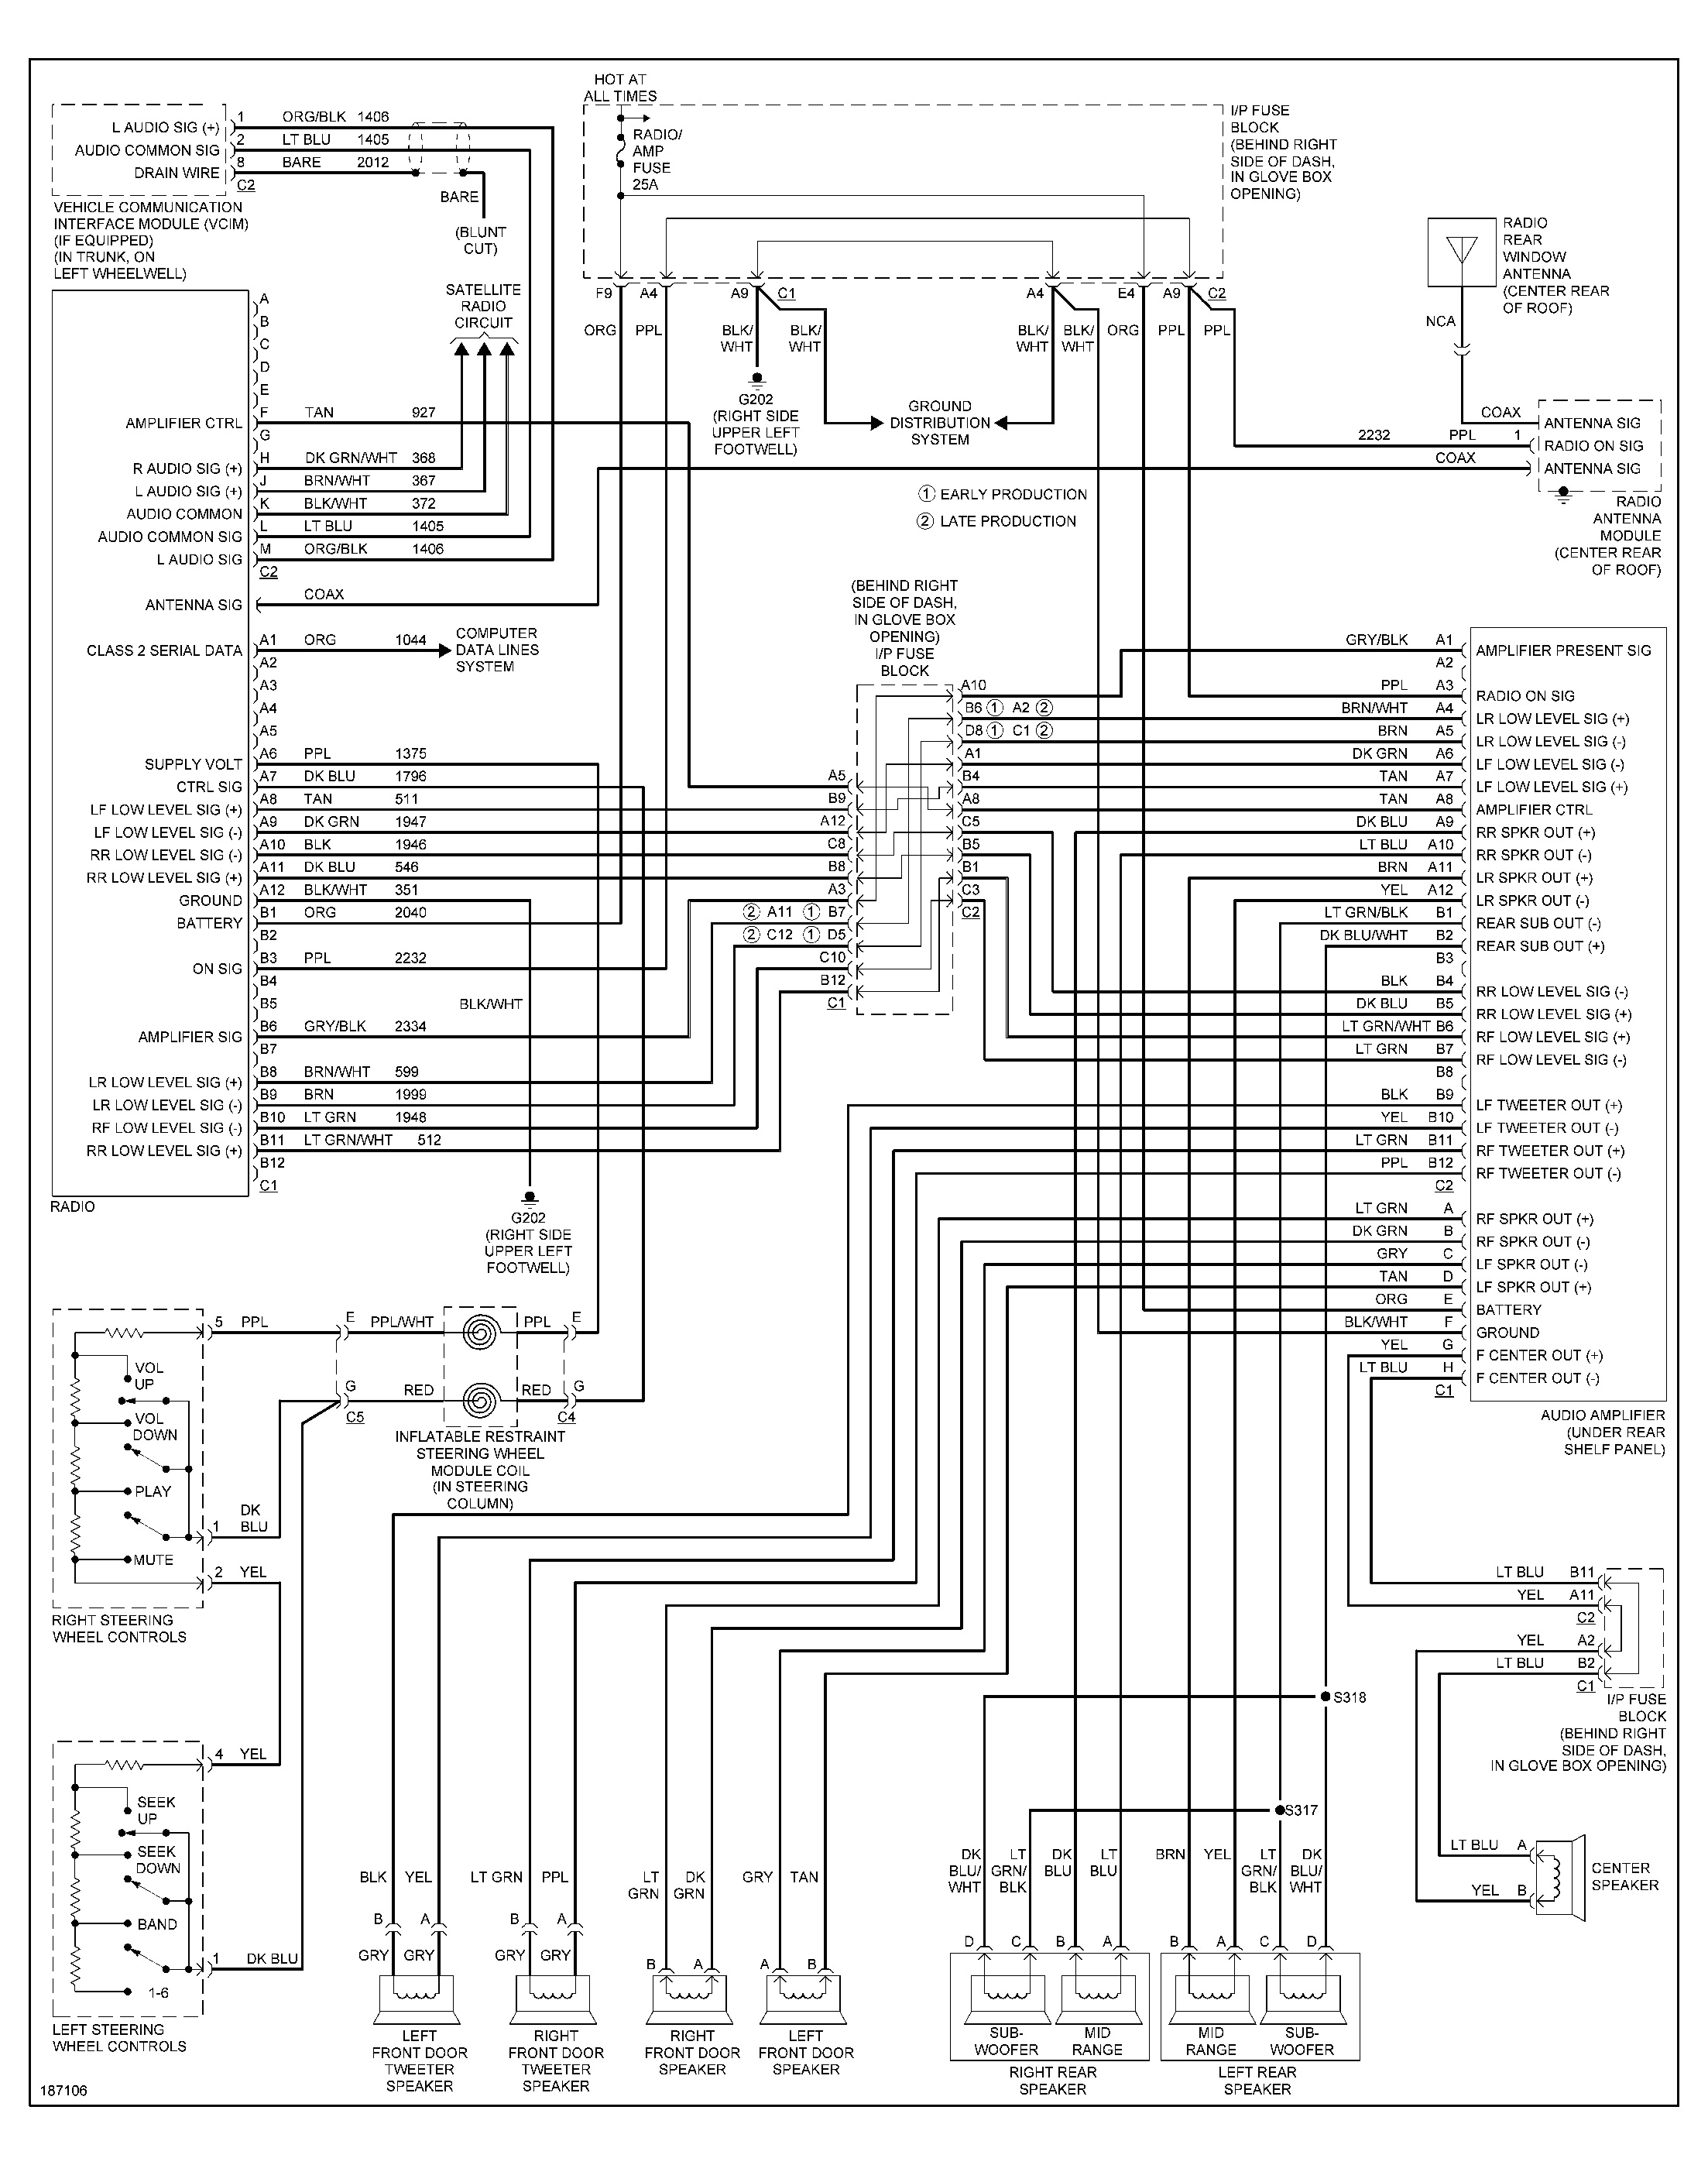 6 0 gto belt diagram blog wiring diagram 2006 gto power windows wiring diagram